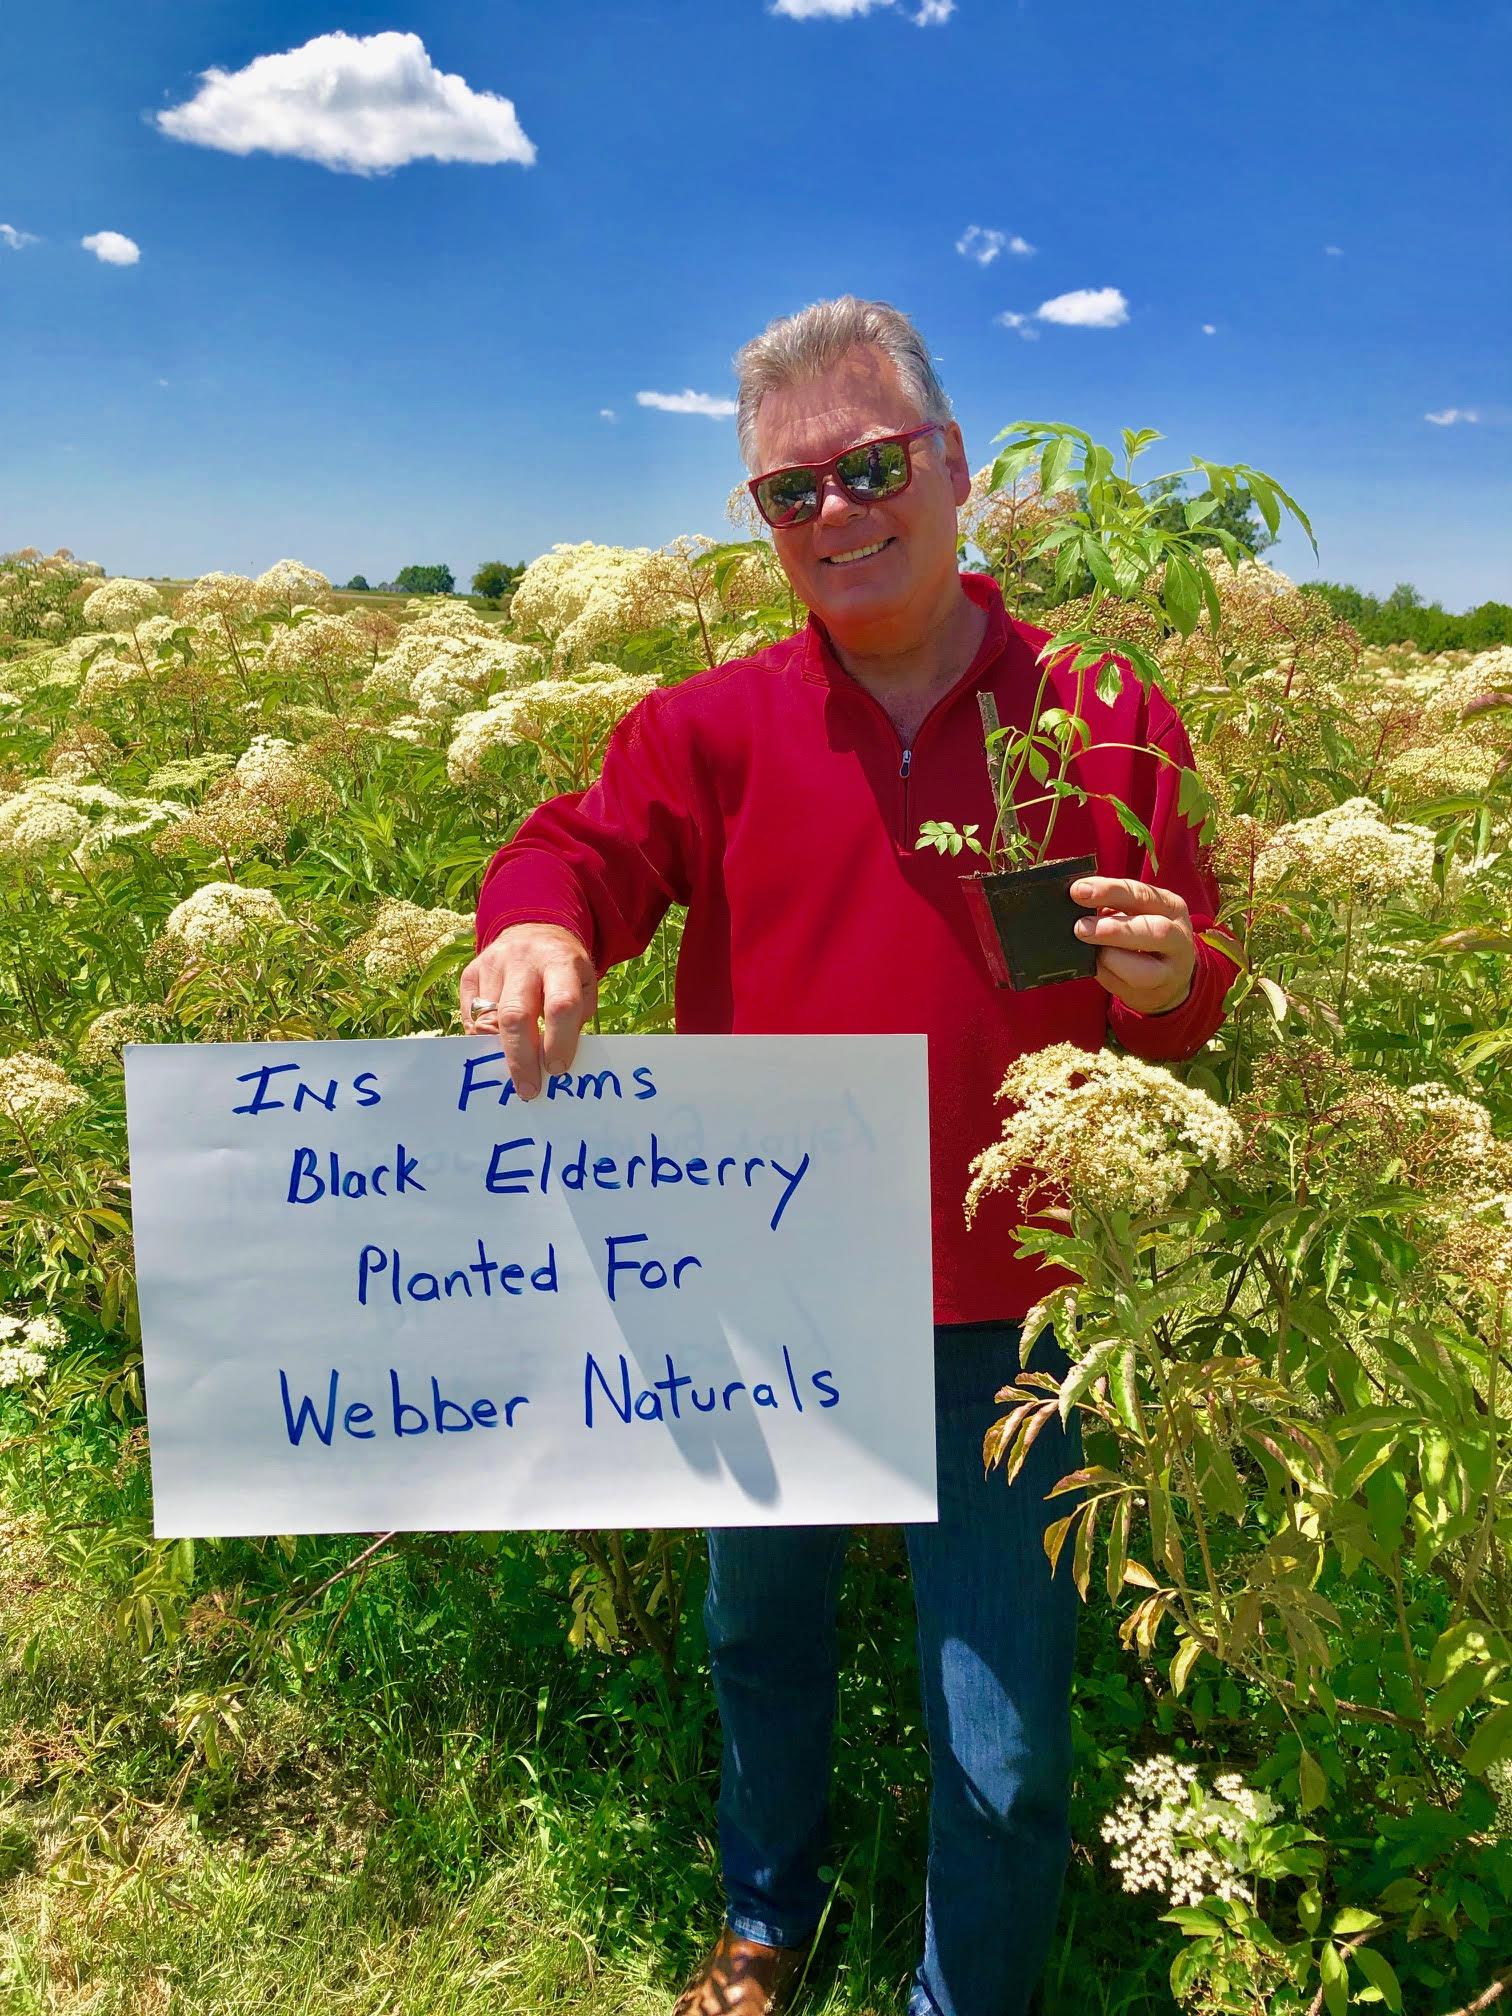 Plant-Elderberry-Webber-Naturals.jpg